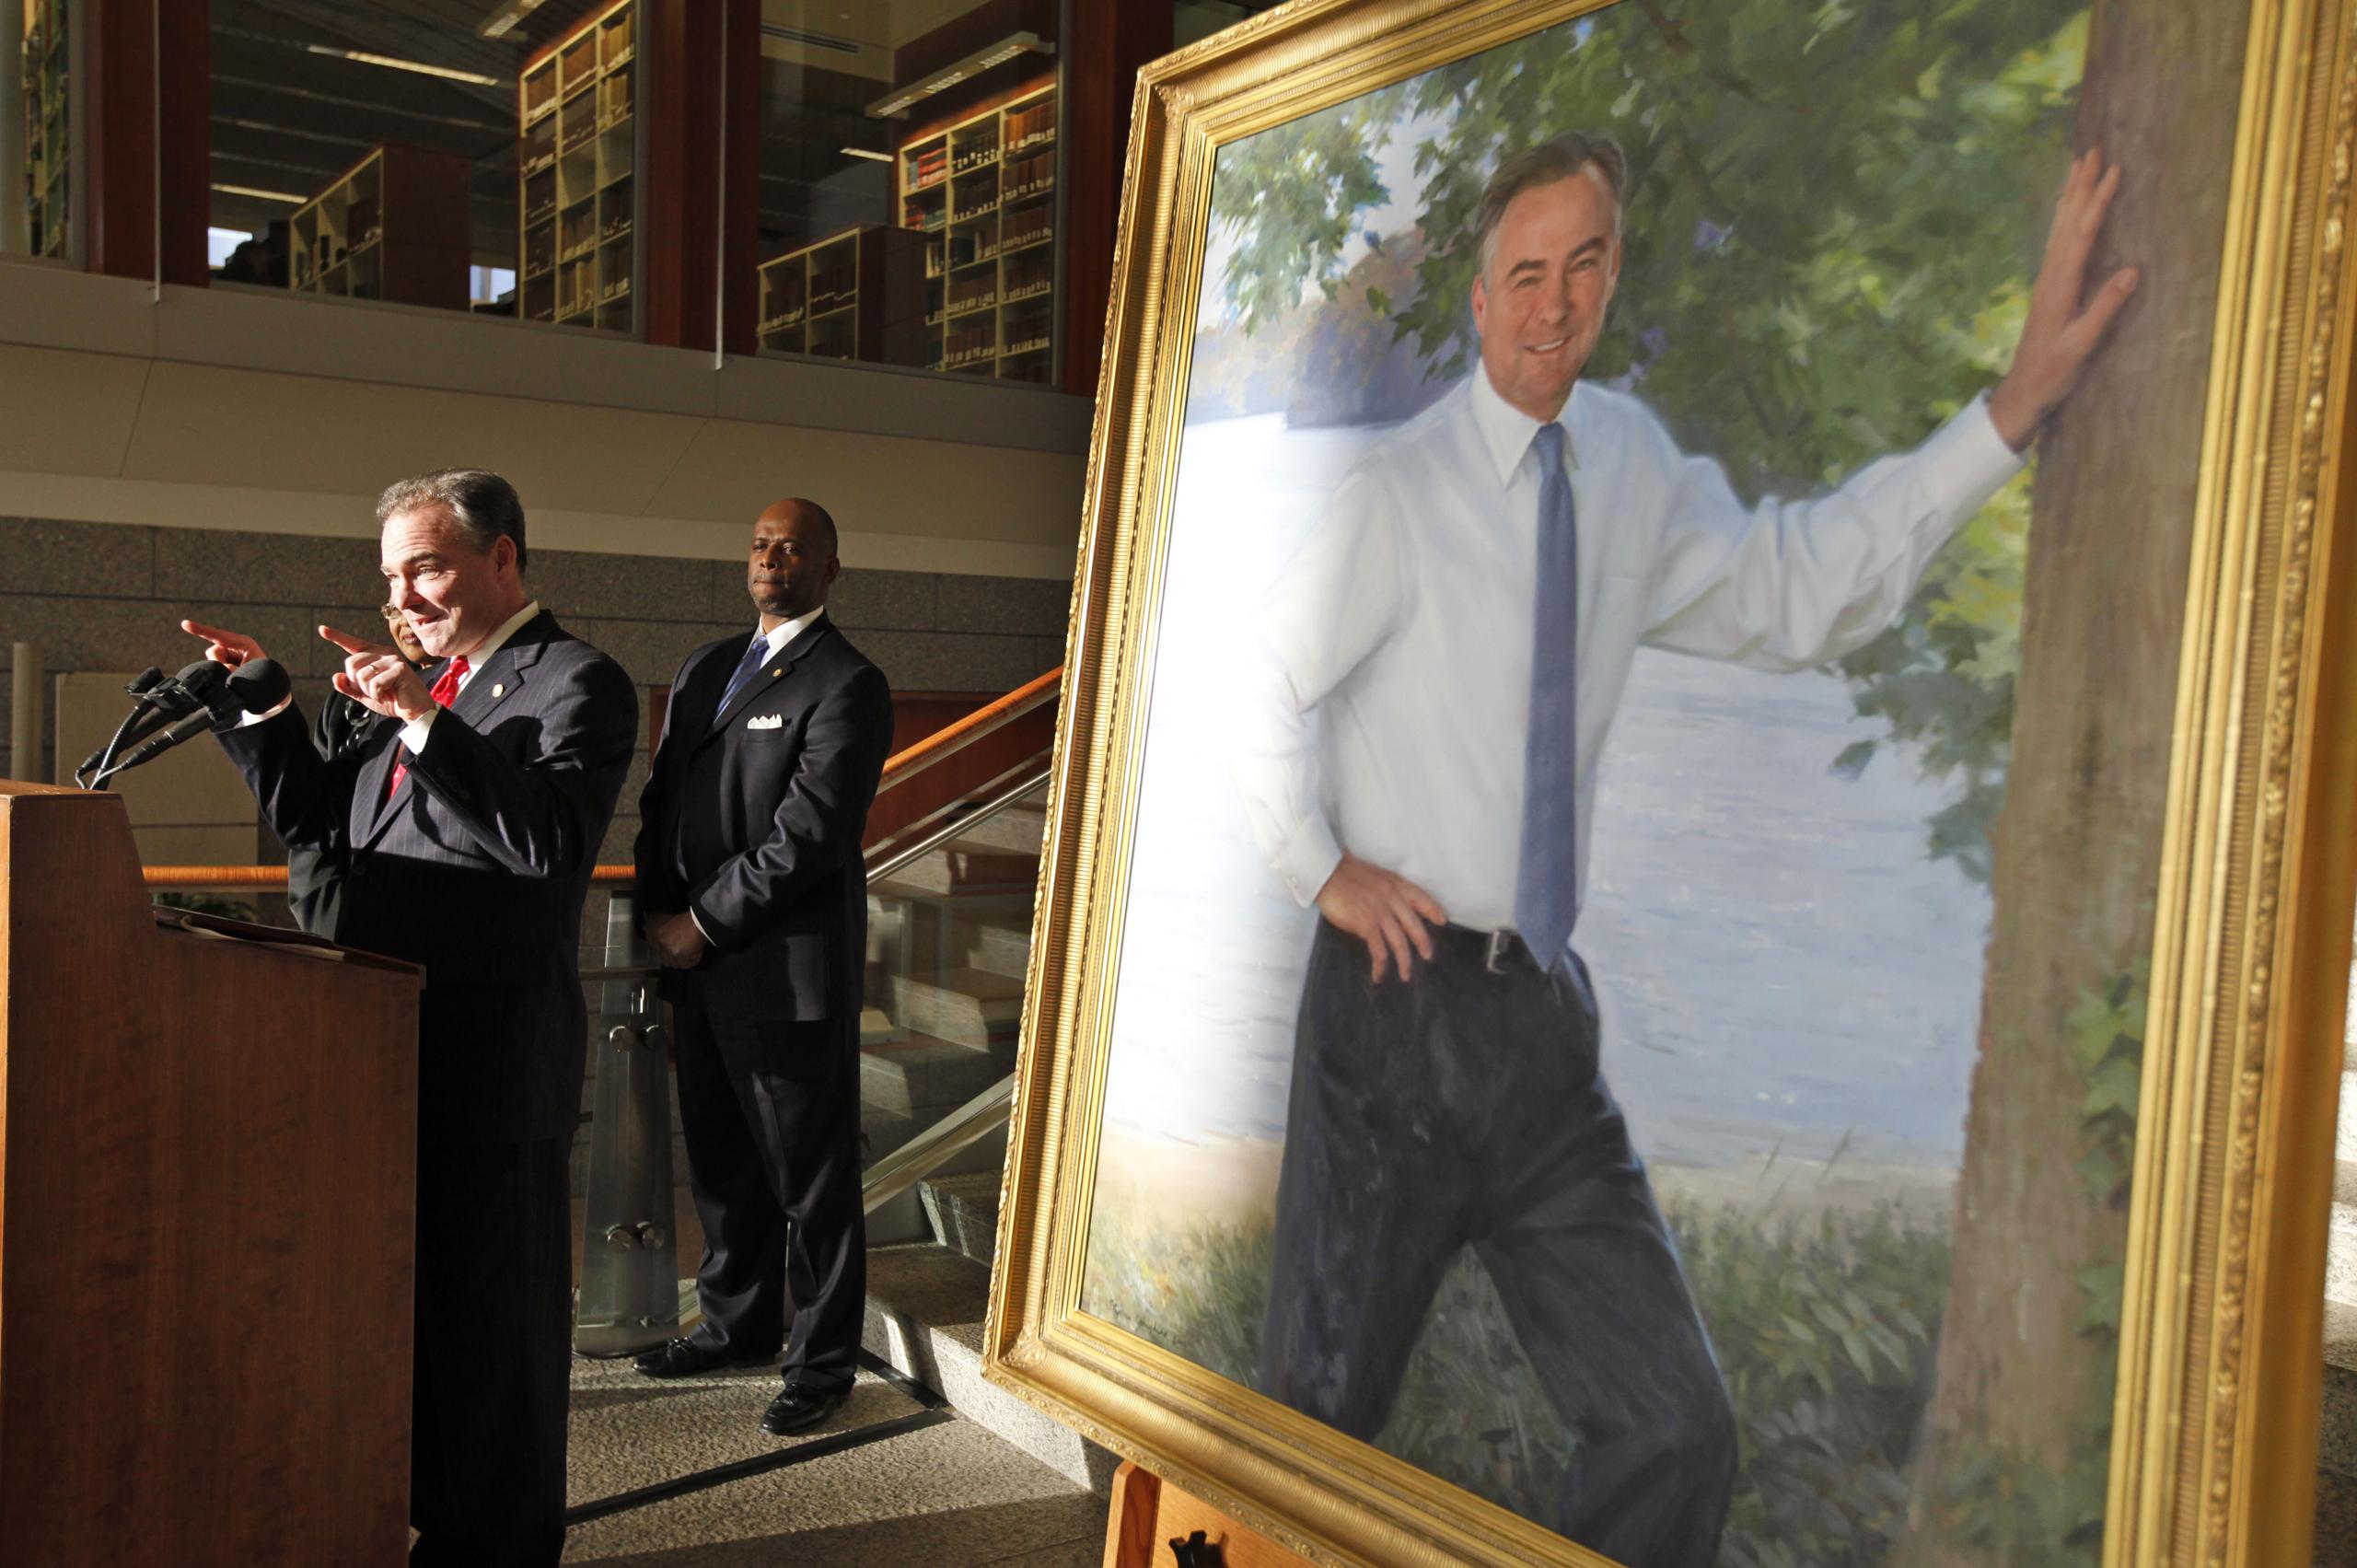 Virginia Gov. Tim Kaine gestures as he speaks during his portrait unveiling ceremony in Richmond on Jan. 5, 2010.